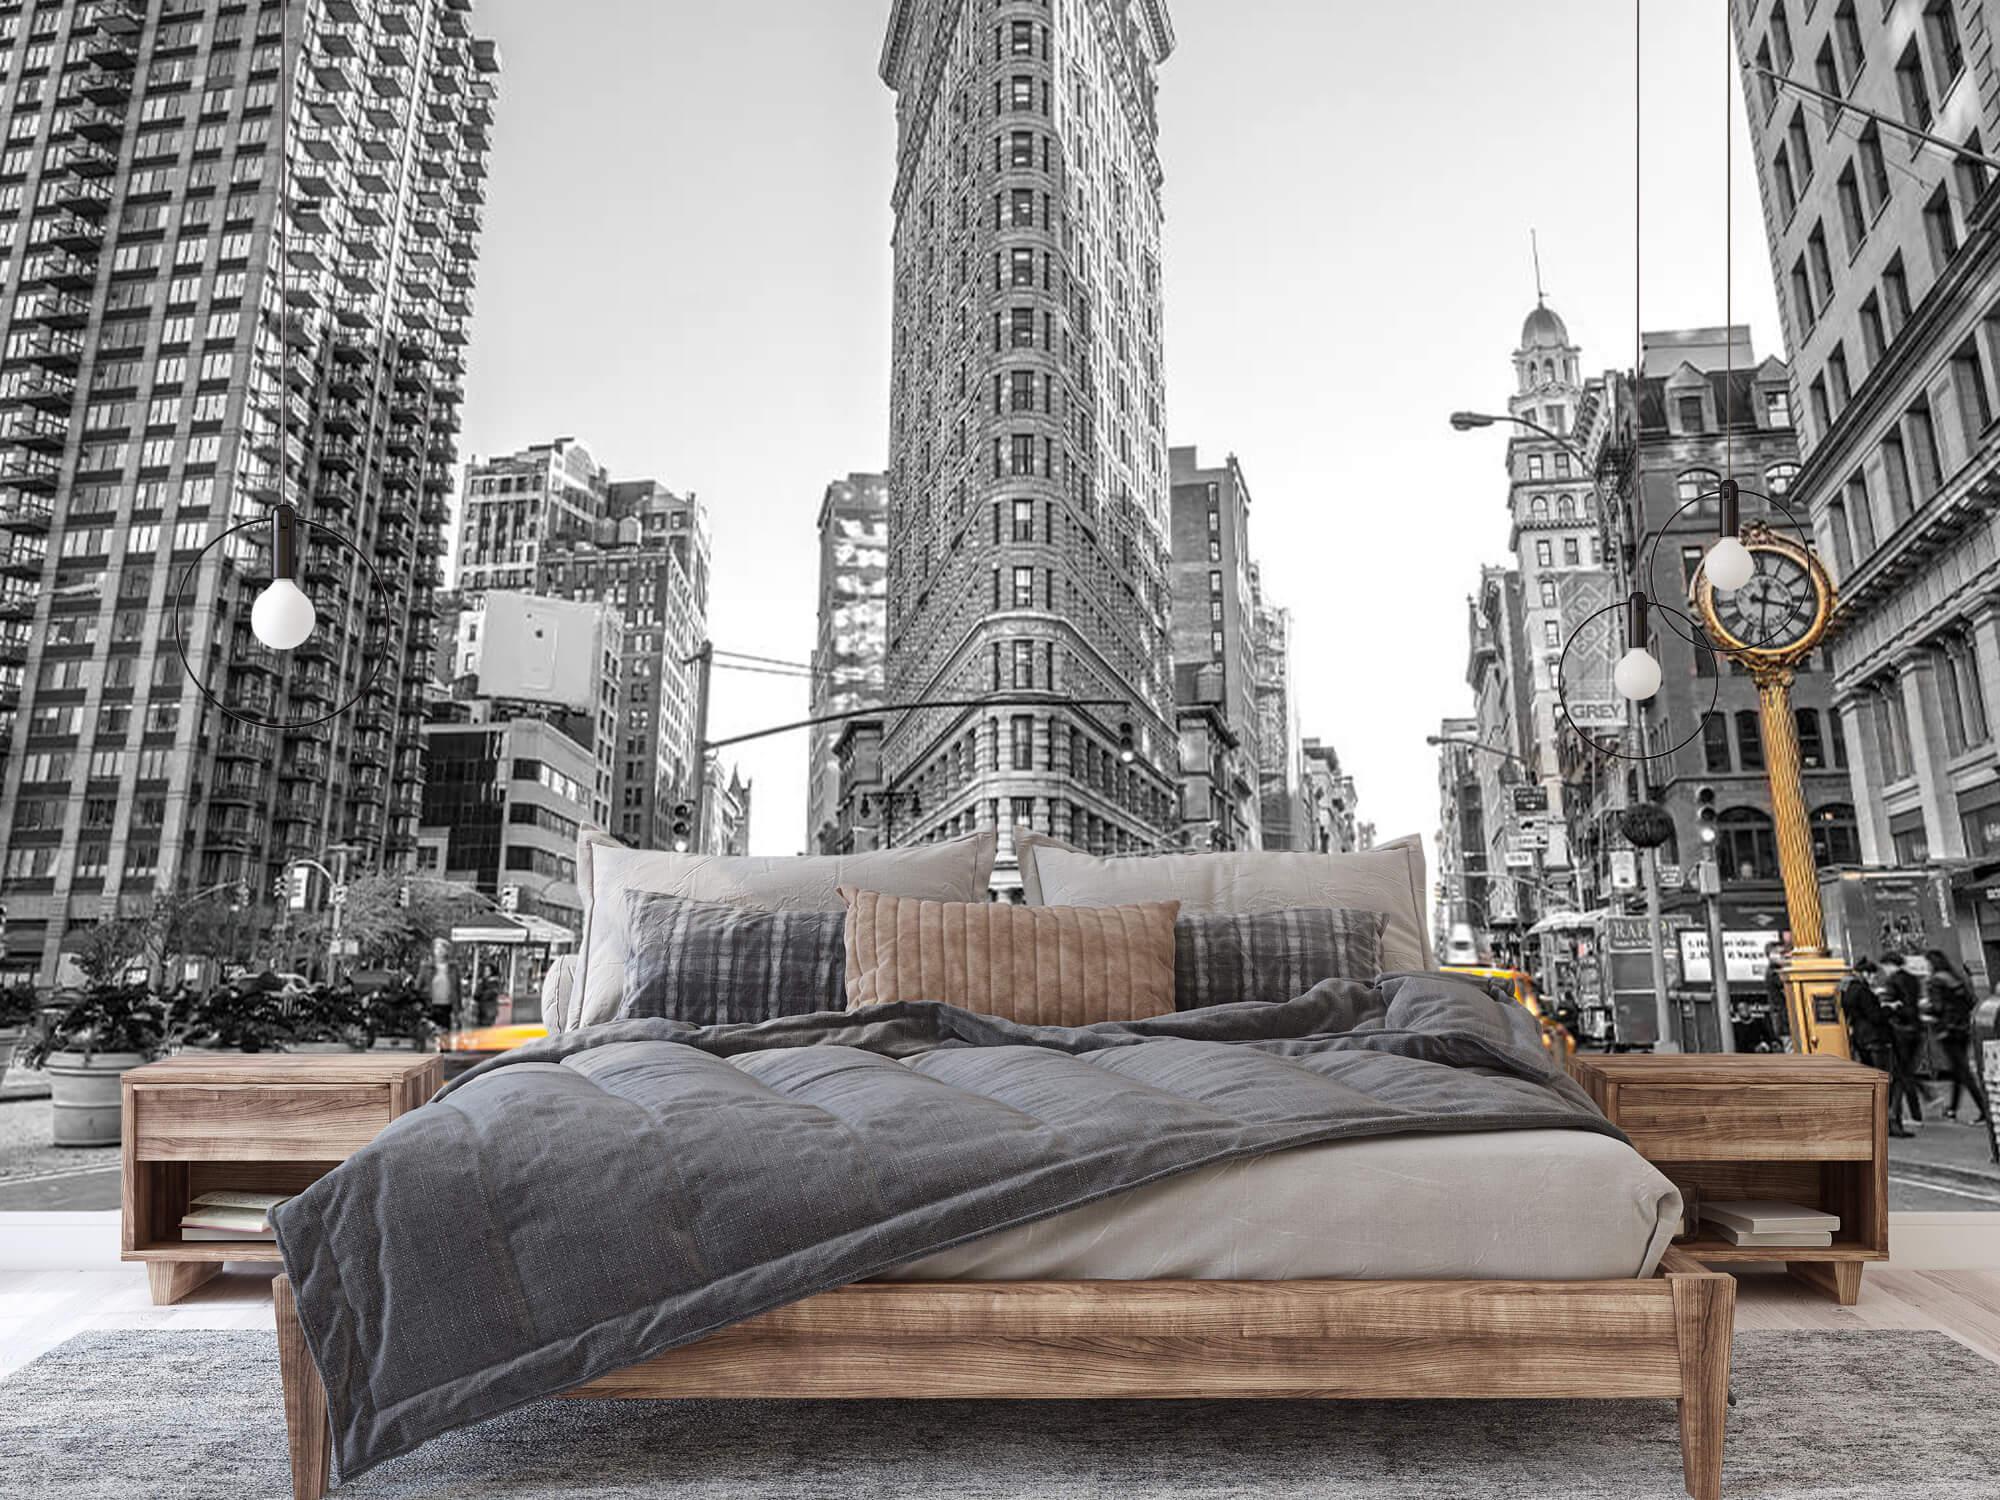 Busy street in New York 6